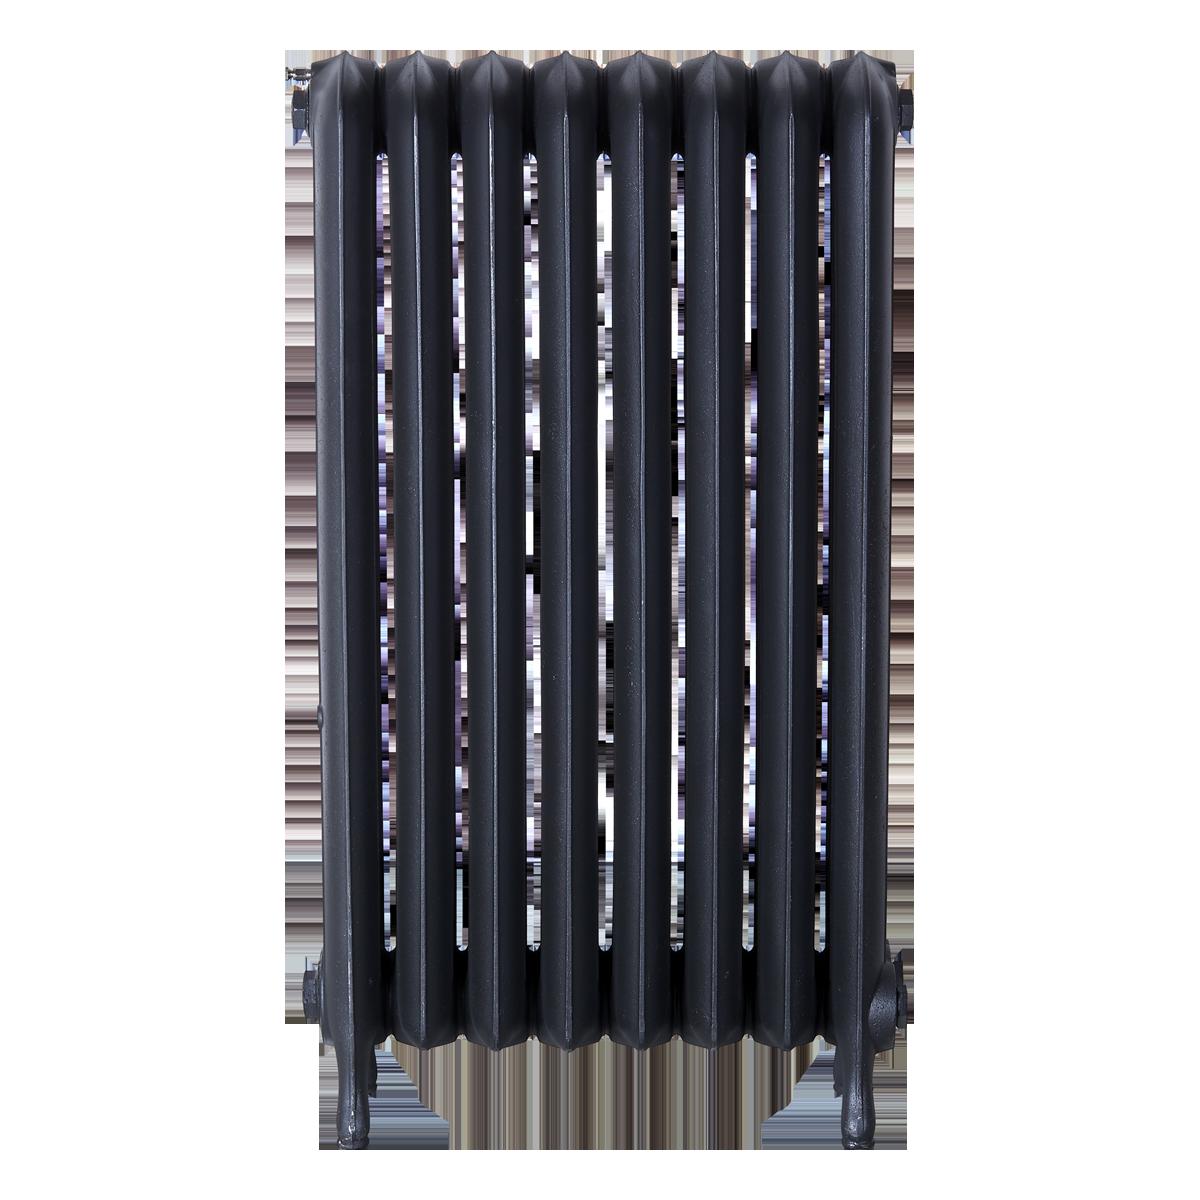 Ironworks Radiators Inc. refurbished cast iron radiator Glendonwynne in black